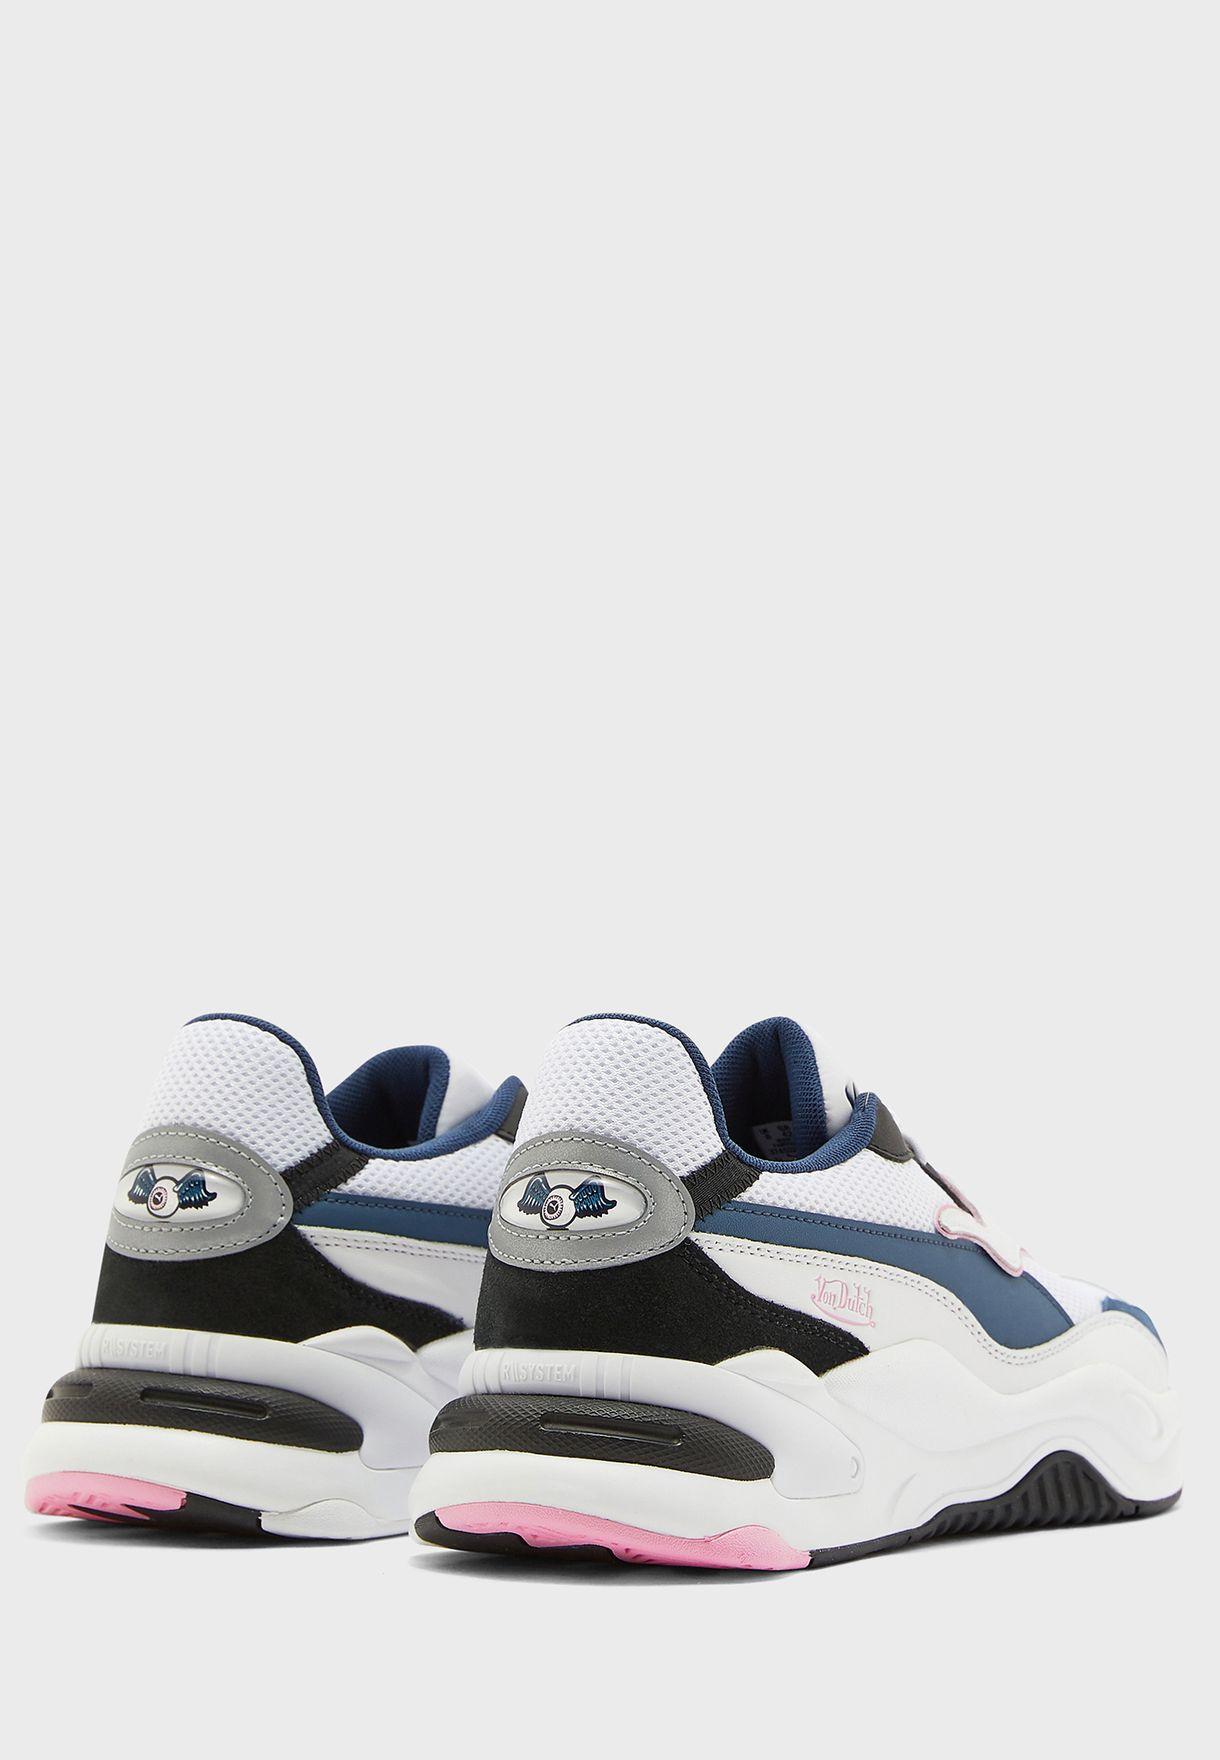 حذاء ار اس-2 كيه فون داتش